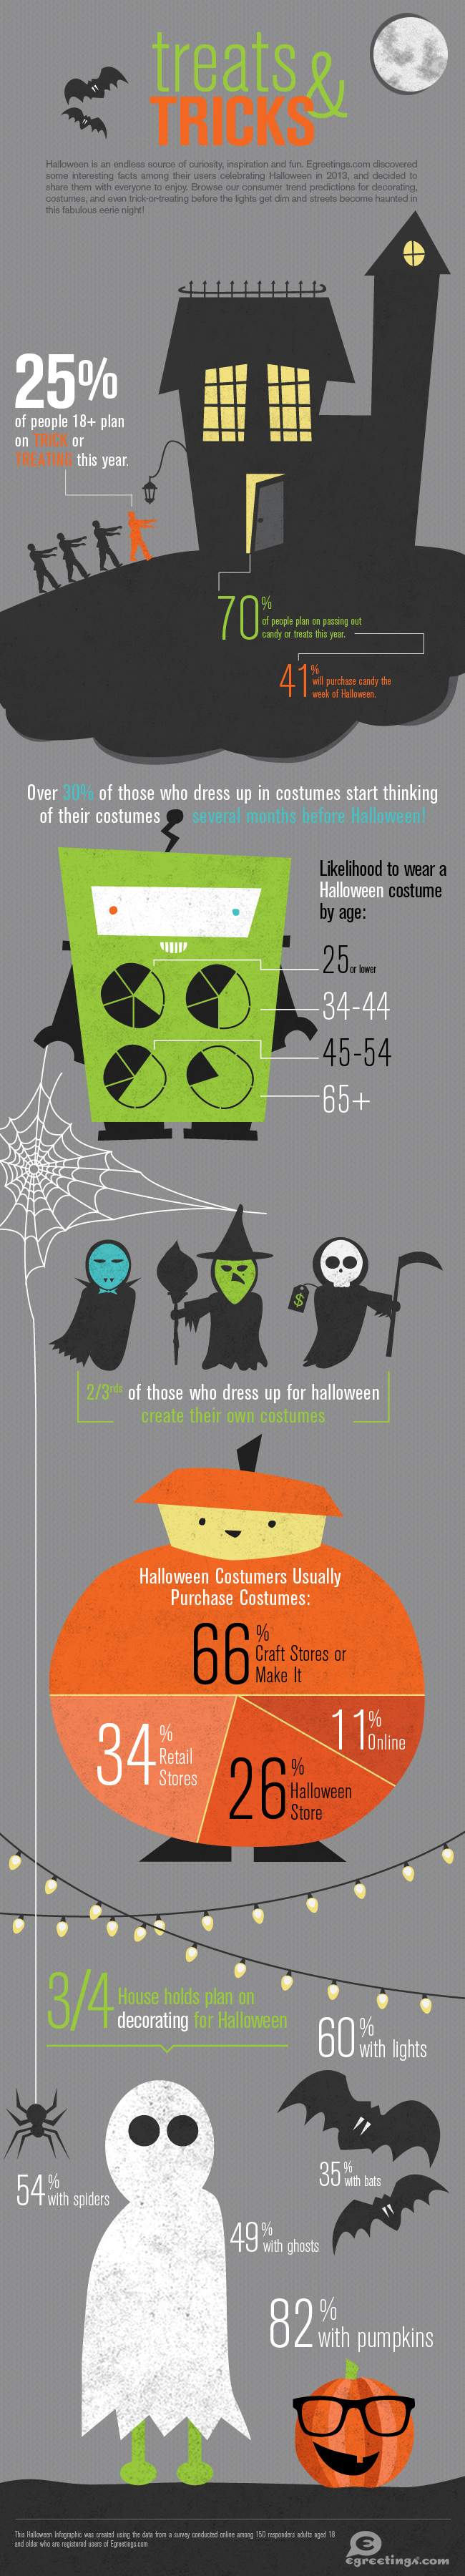 Halloween Infographic 2013